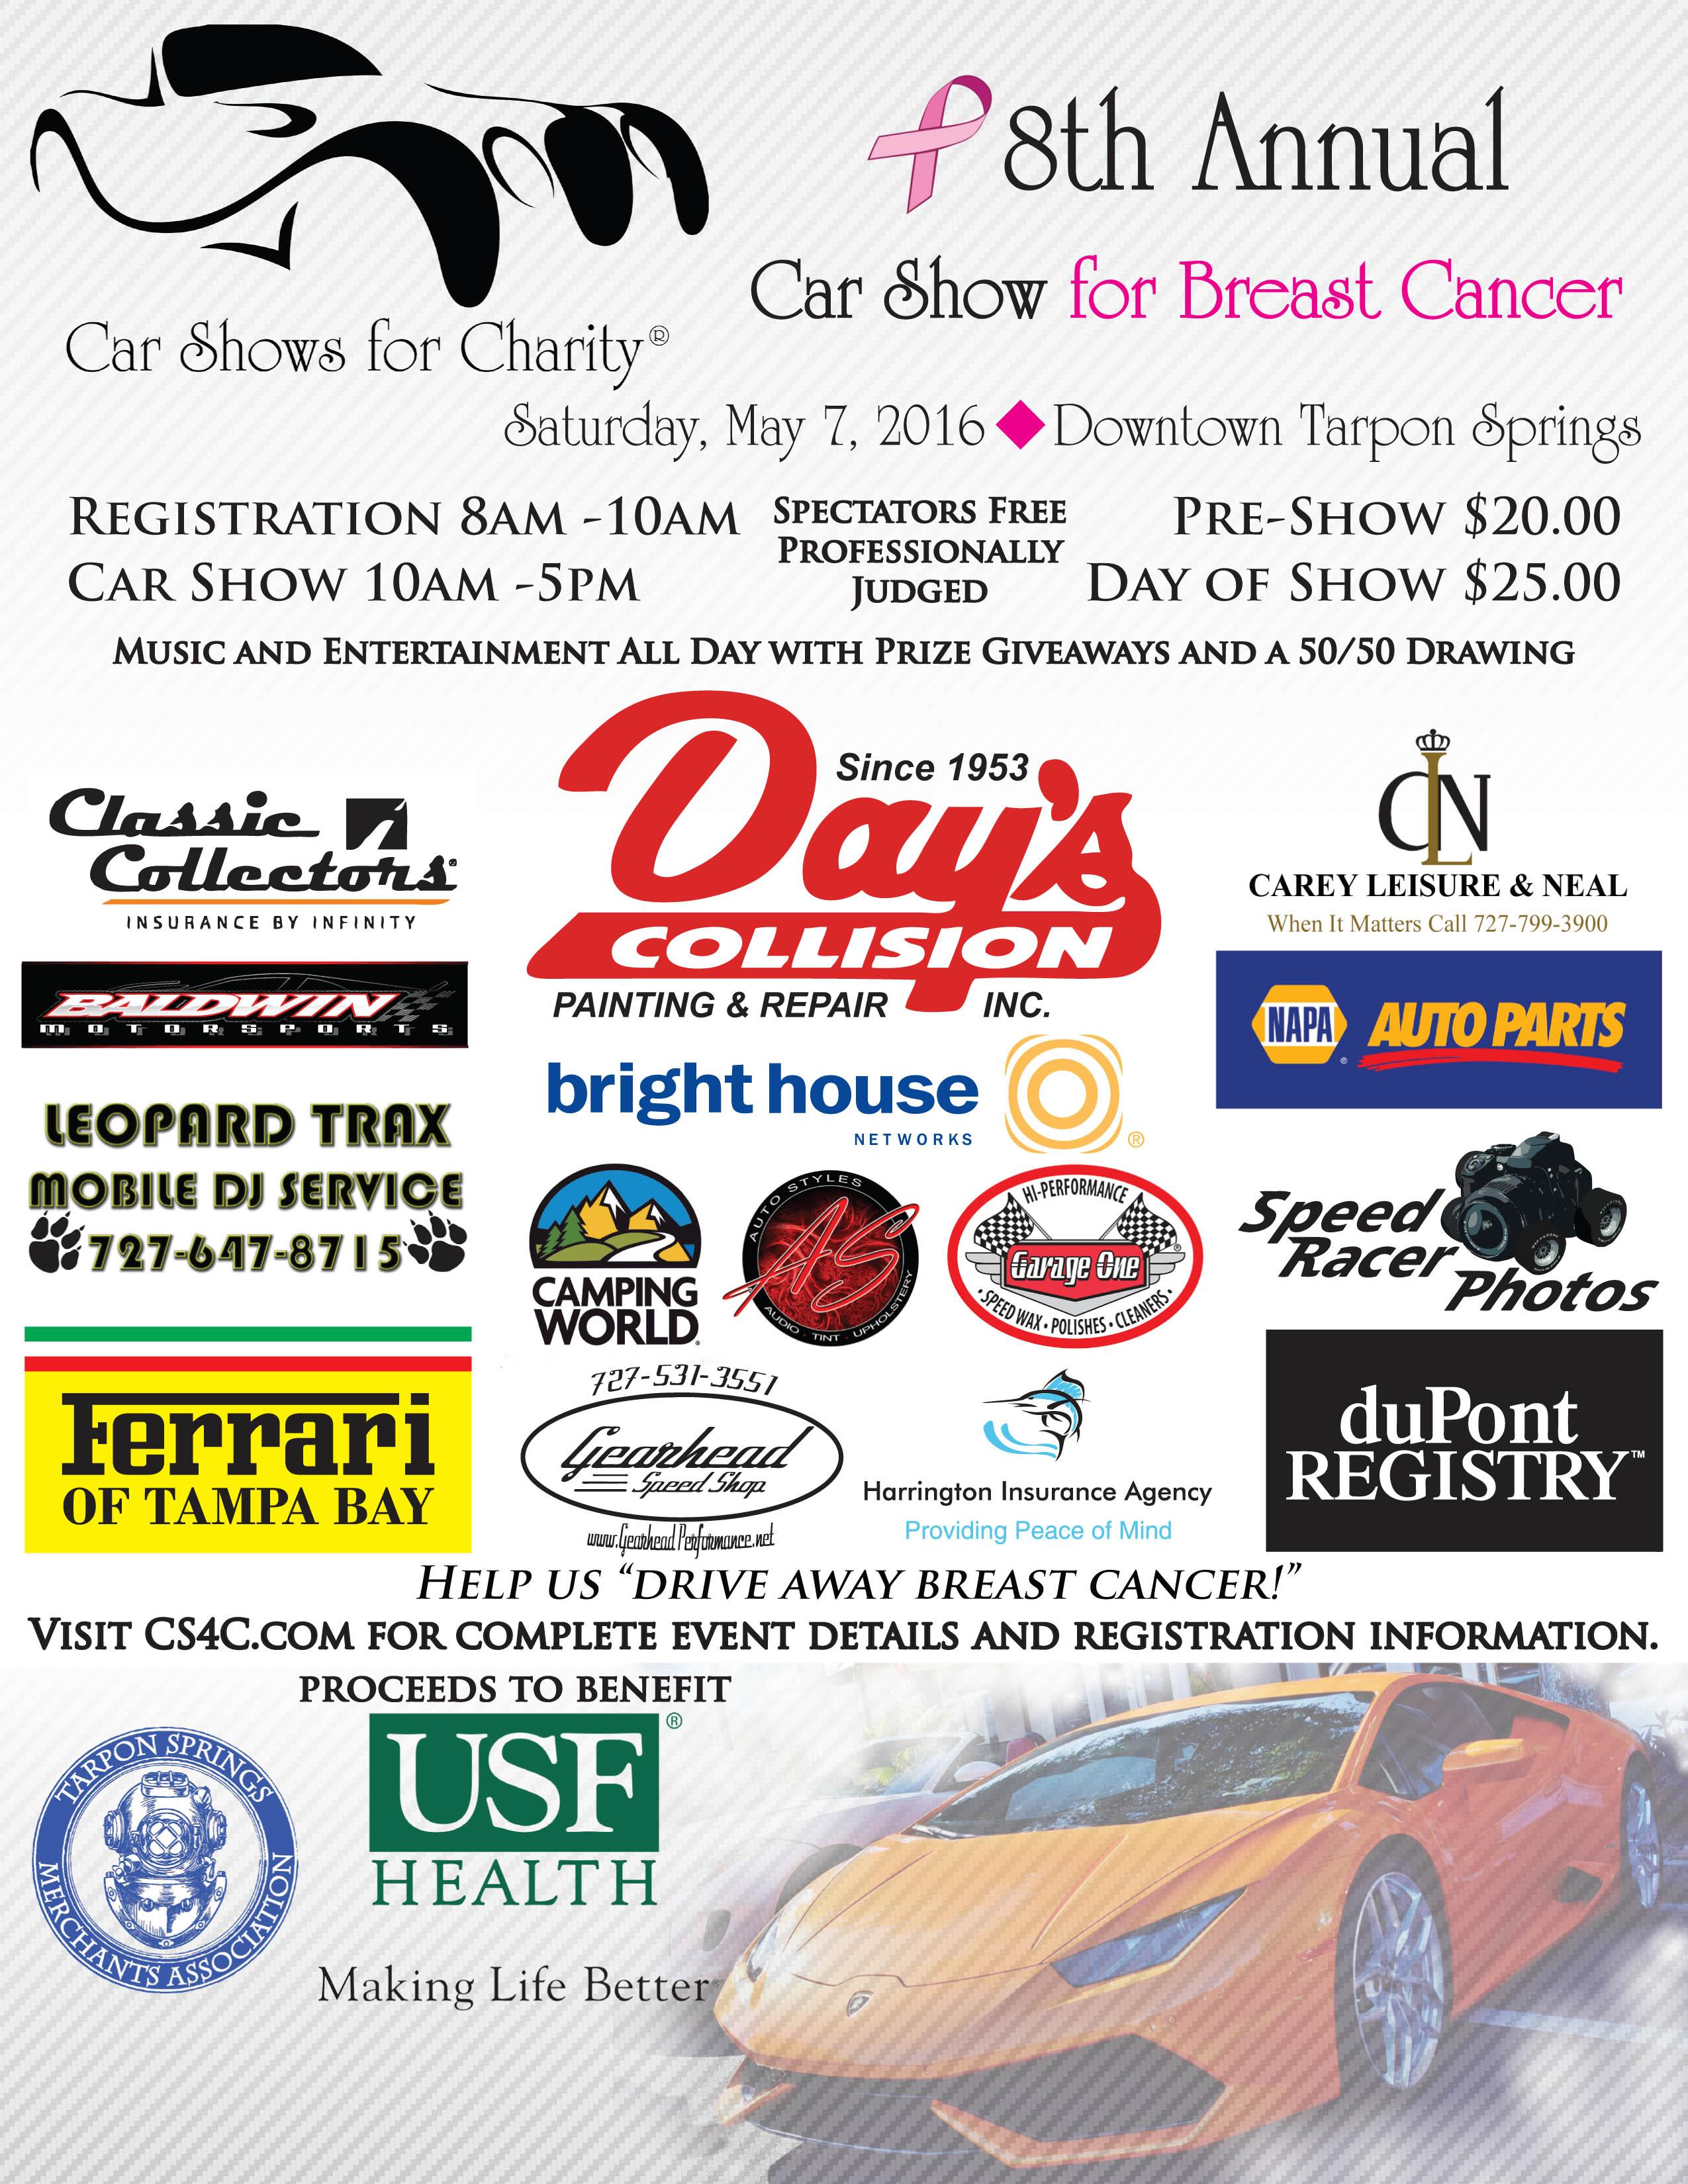 Event Calender Auto Styles - Car show event insurance